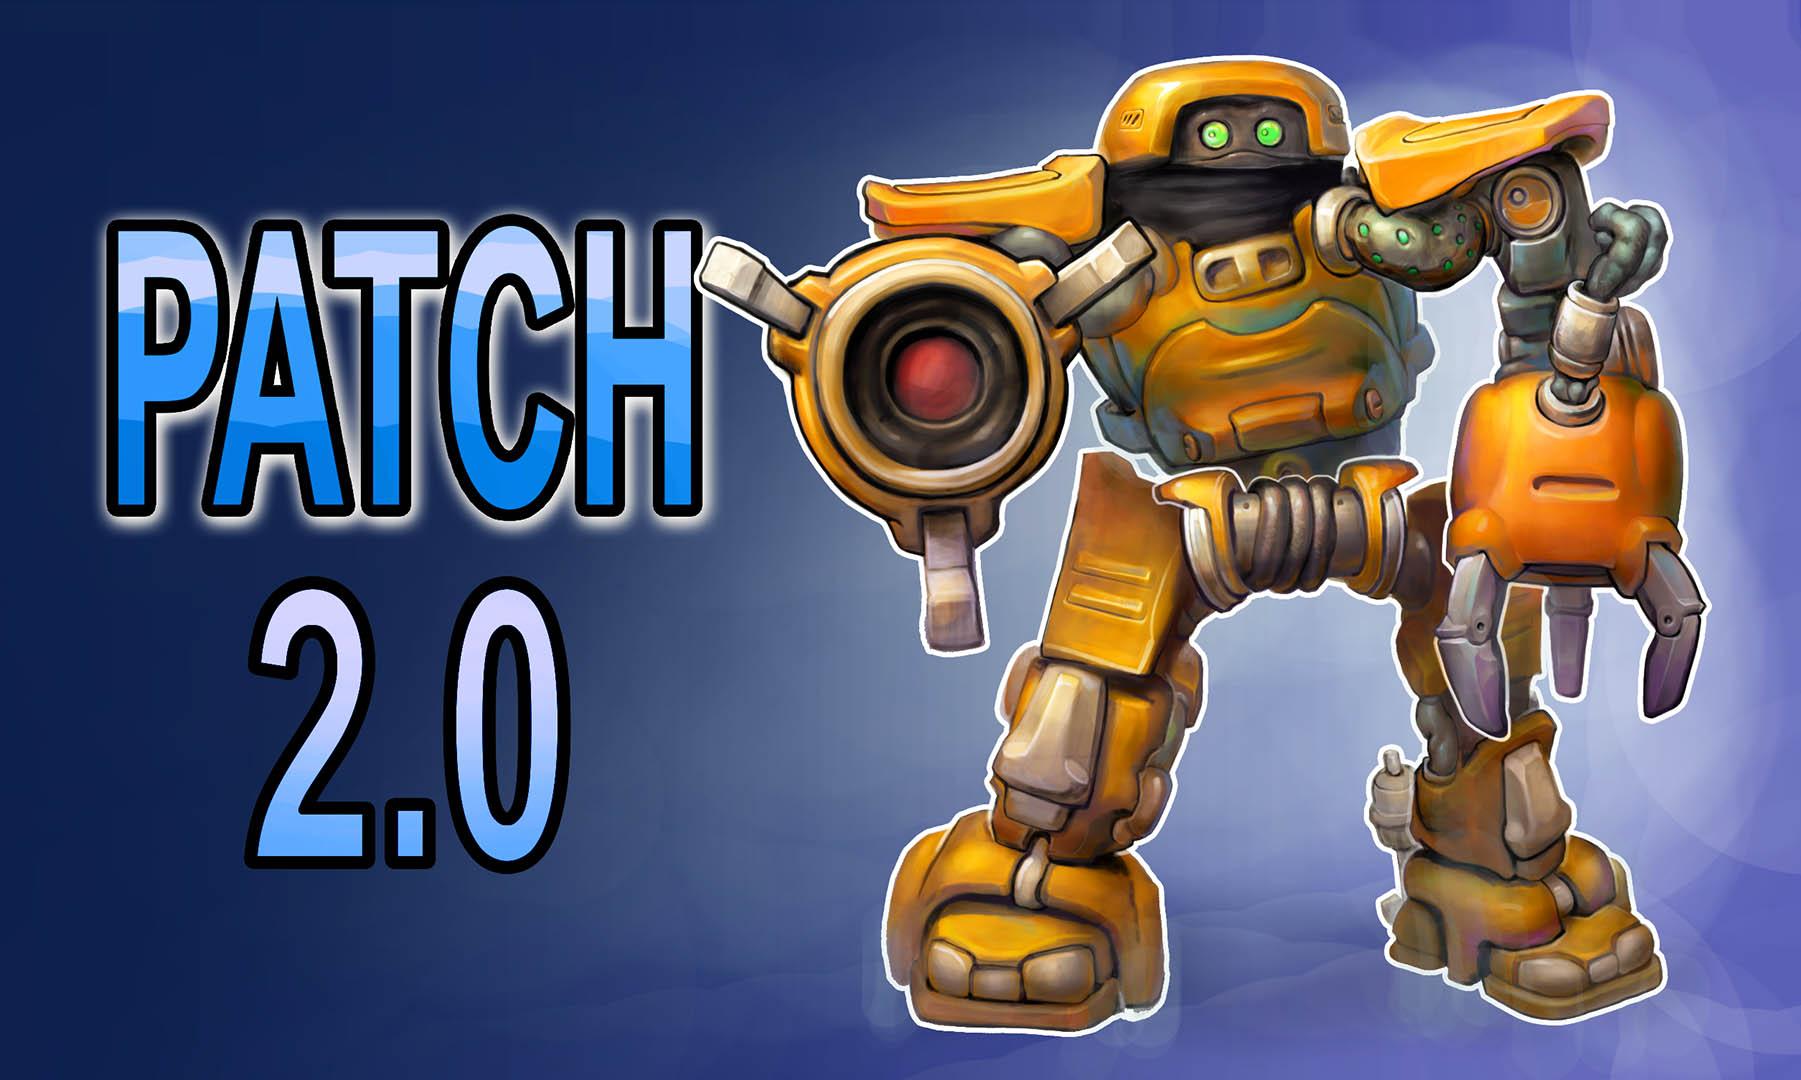 patch 2